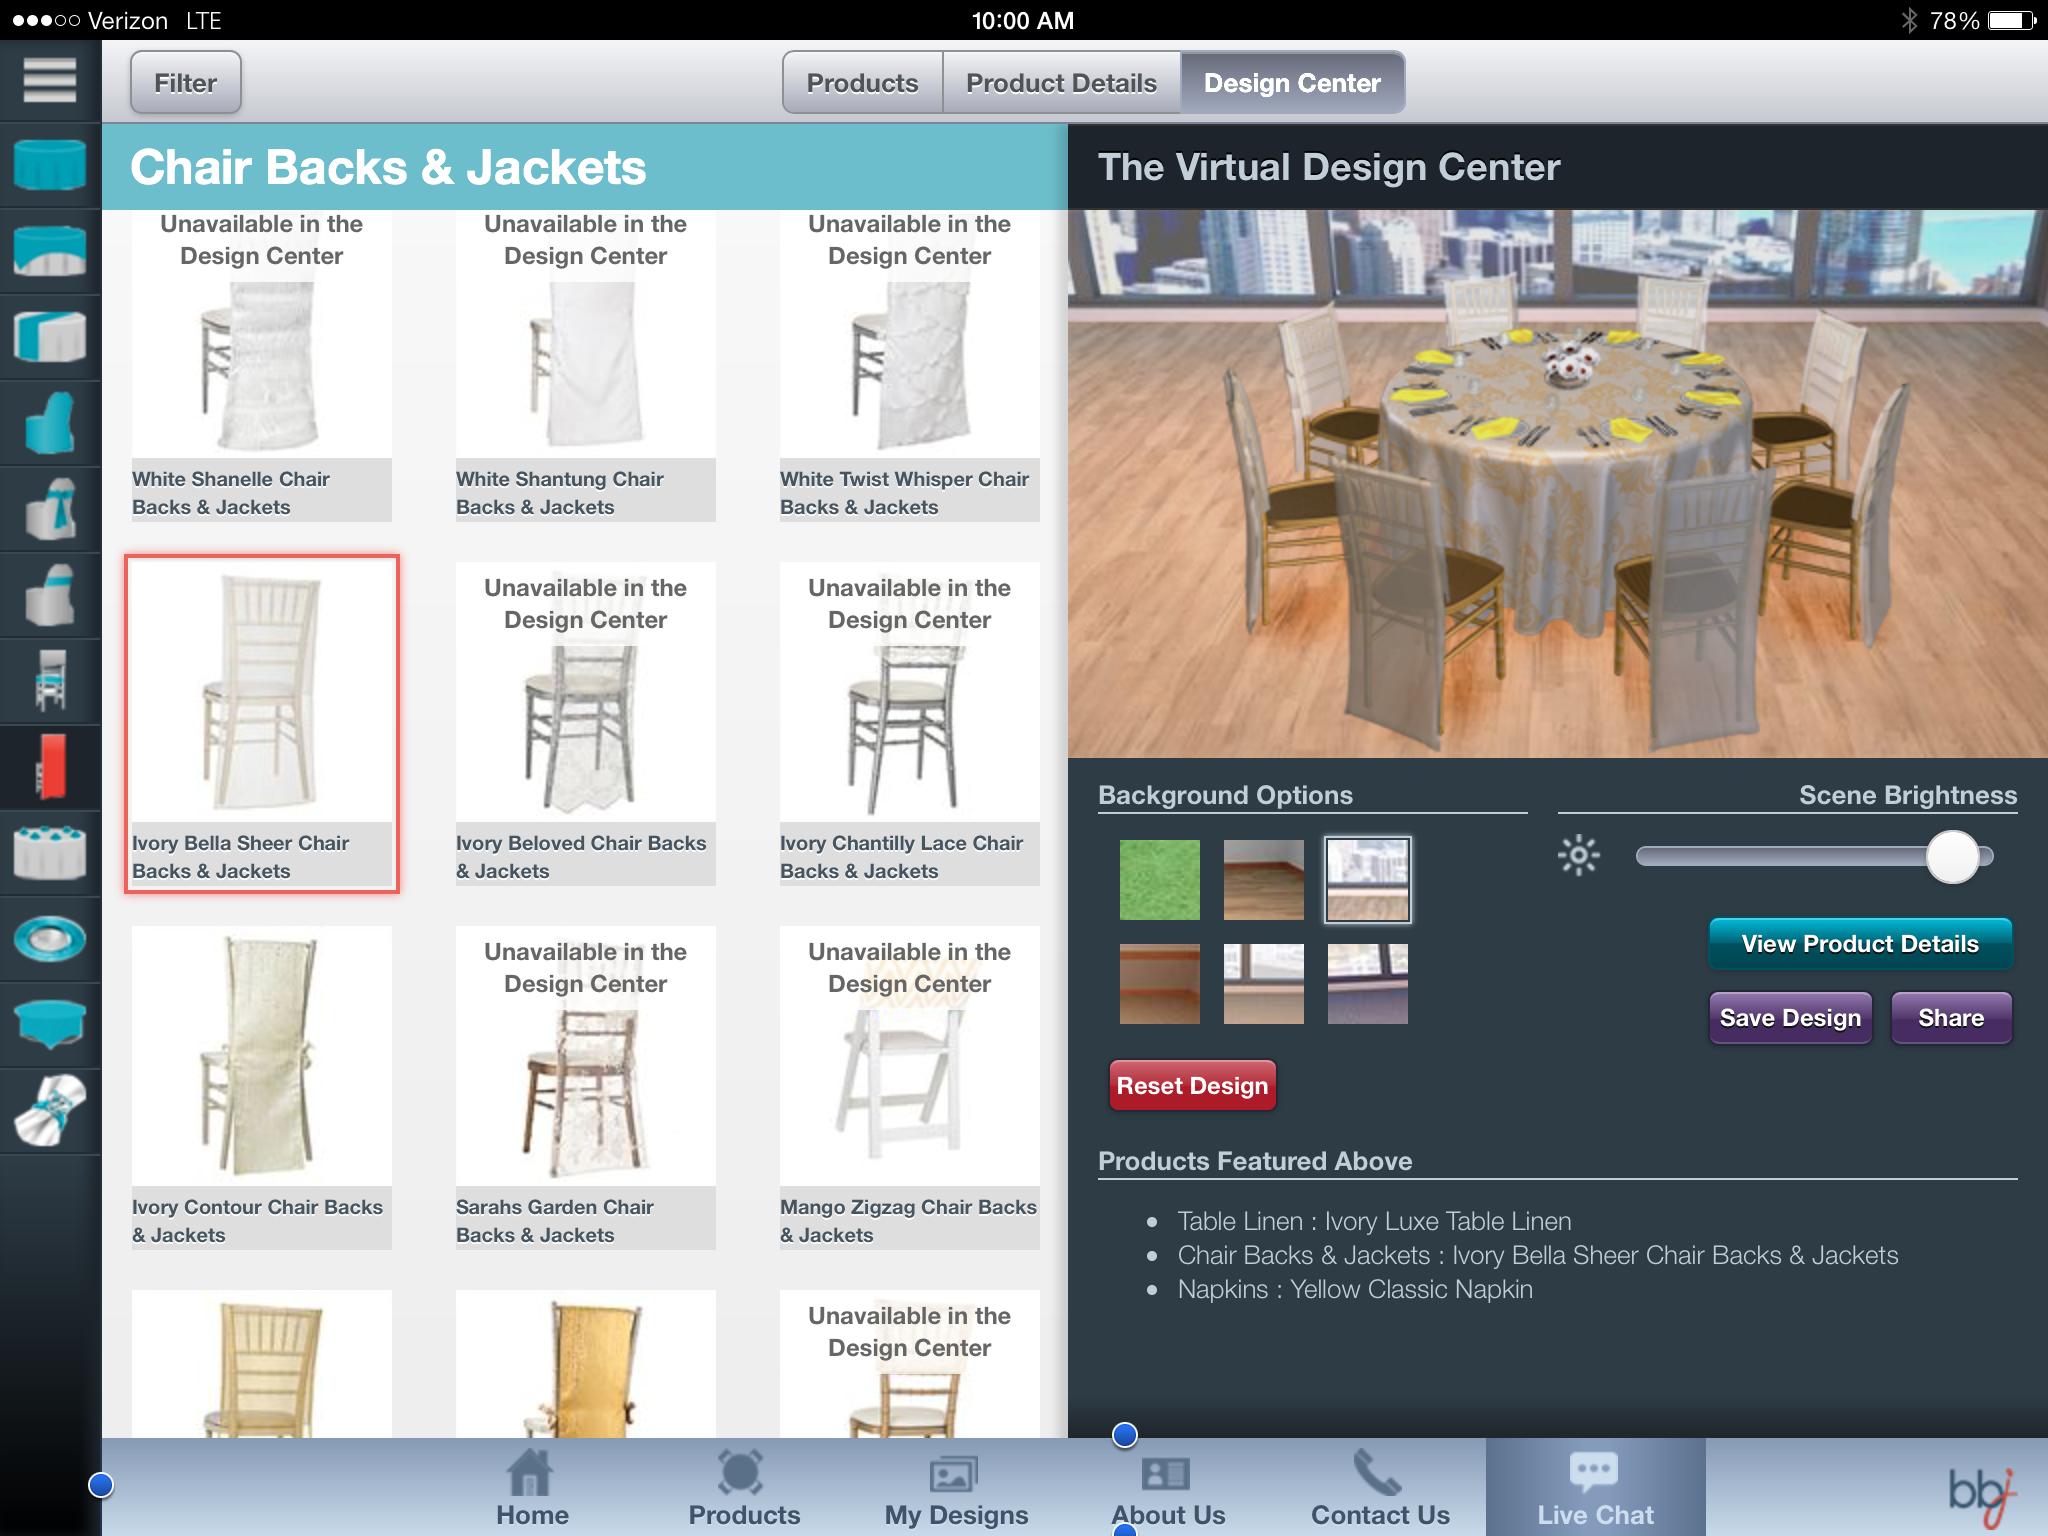 BBJ_AppArticle_DesignCenter